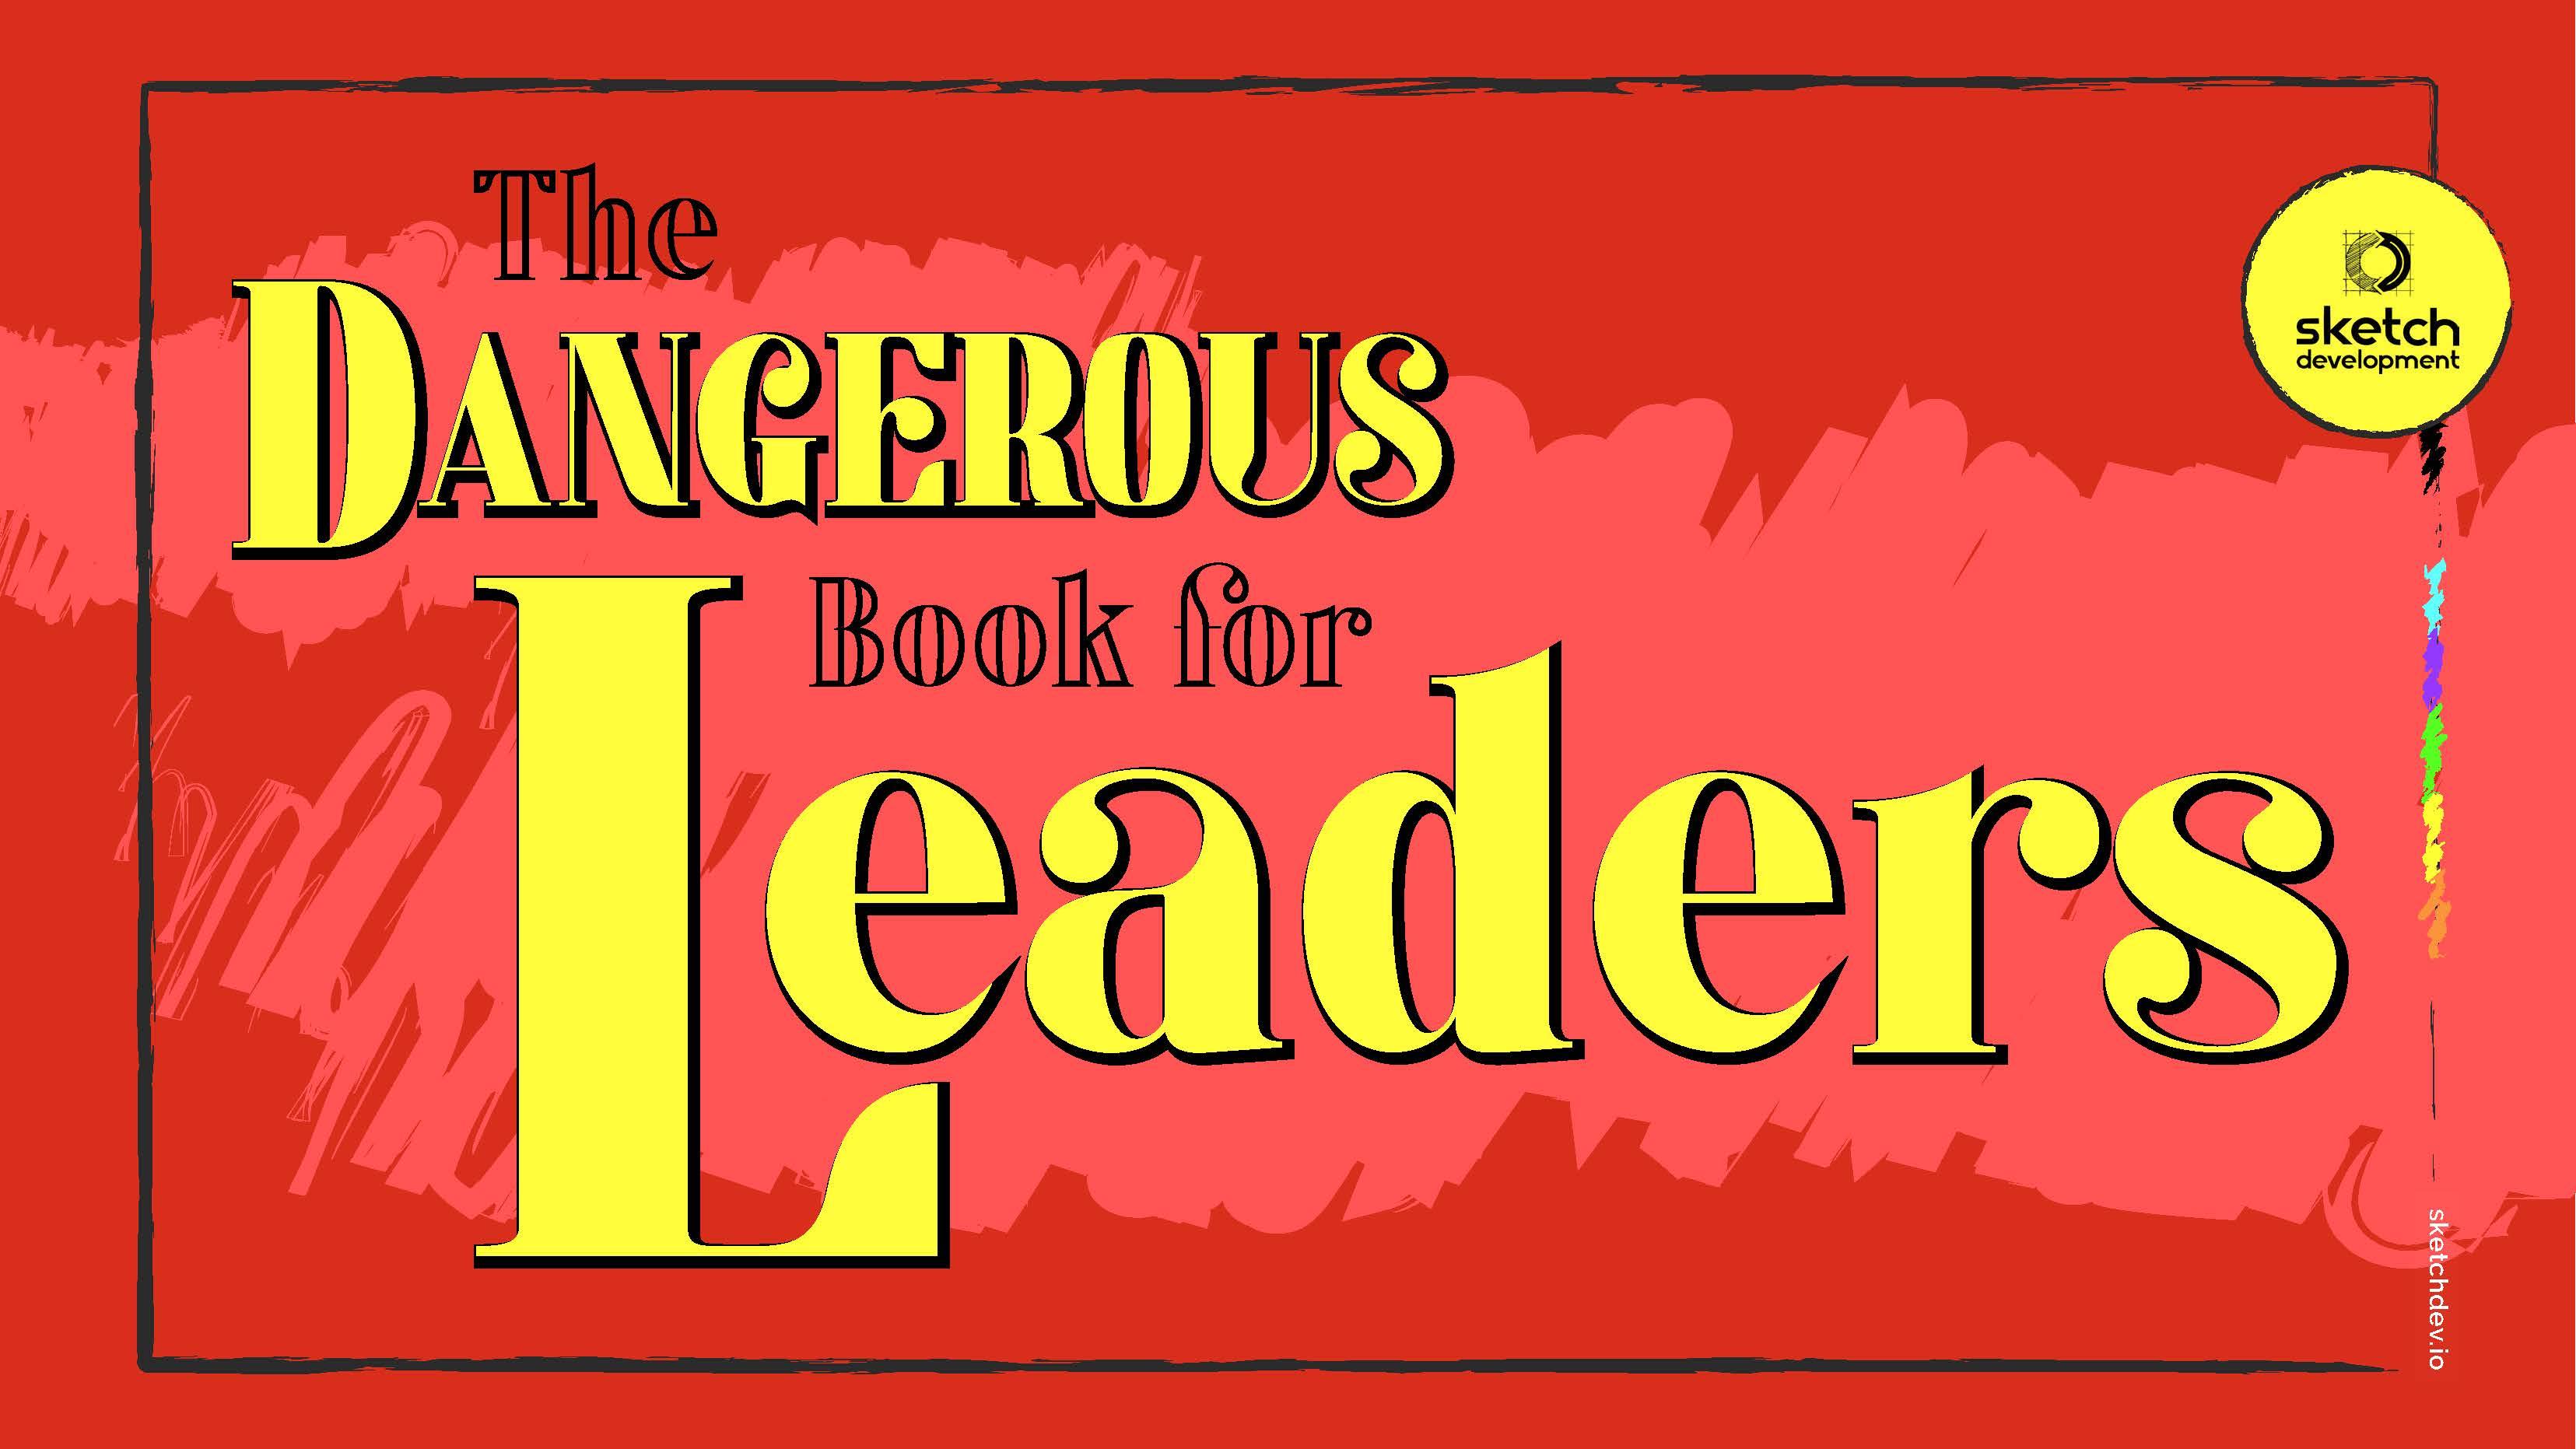 TheDangerousBookForLeaders_SketchDevelopment 1